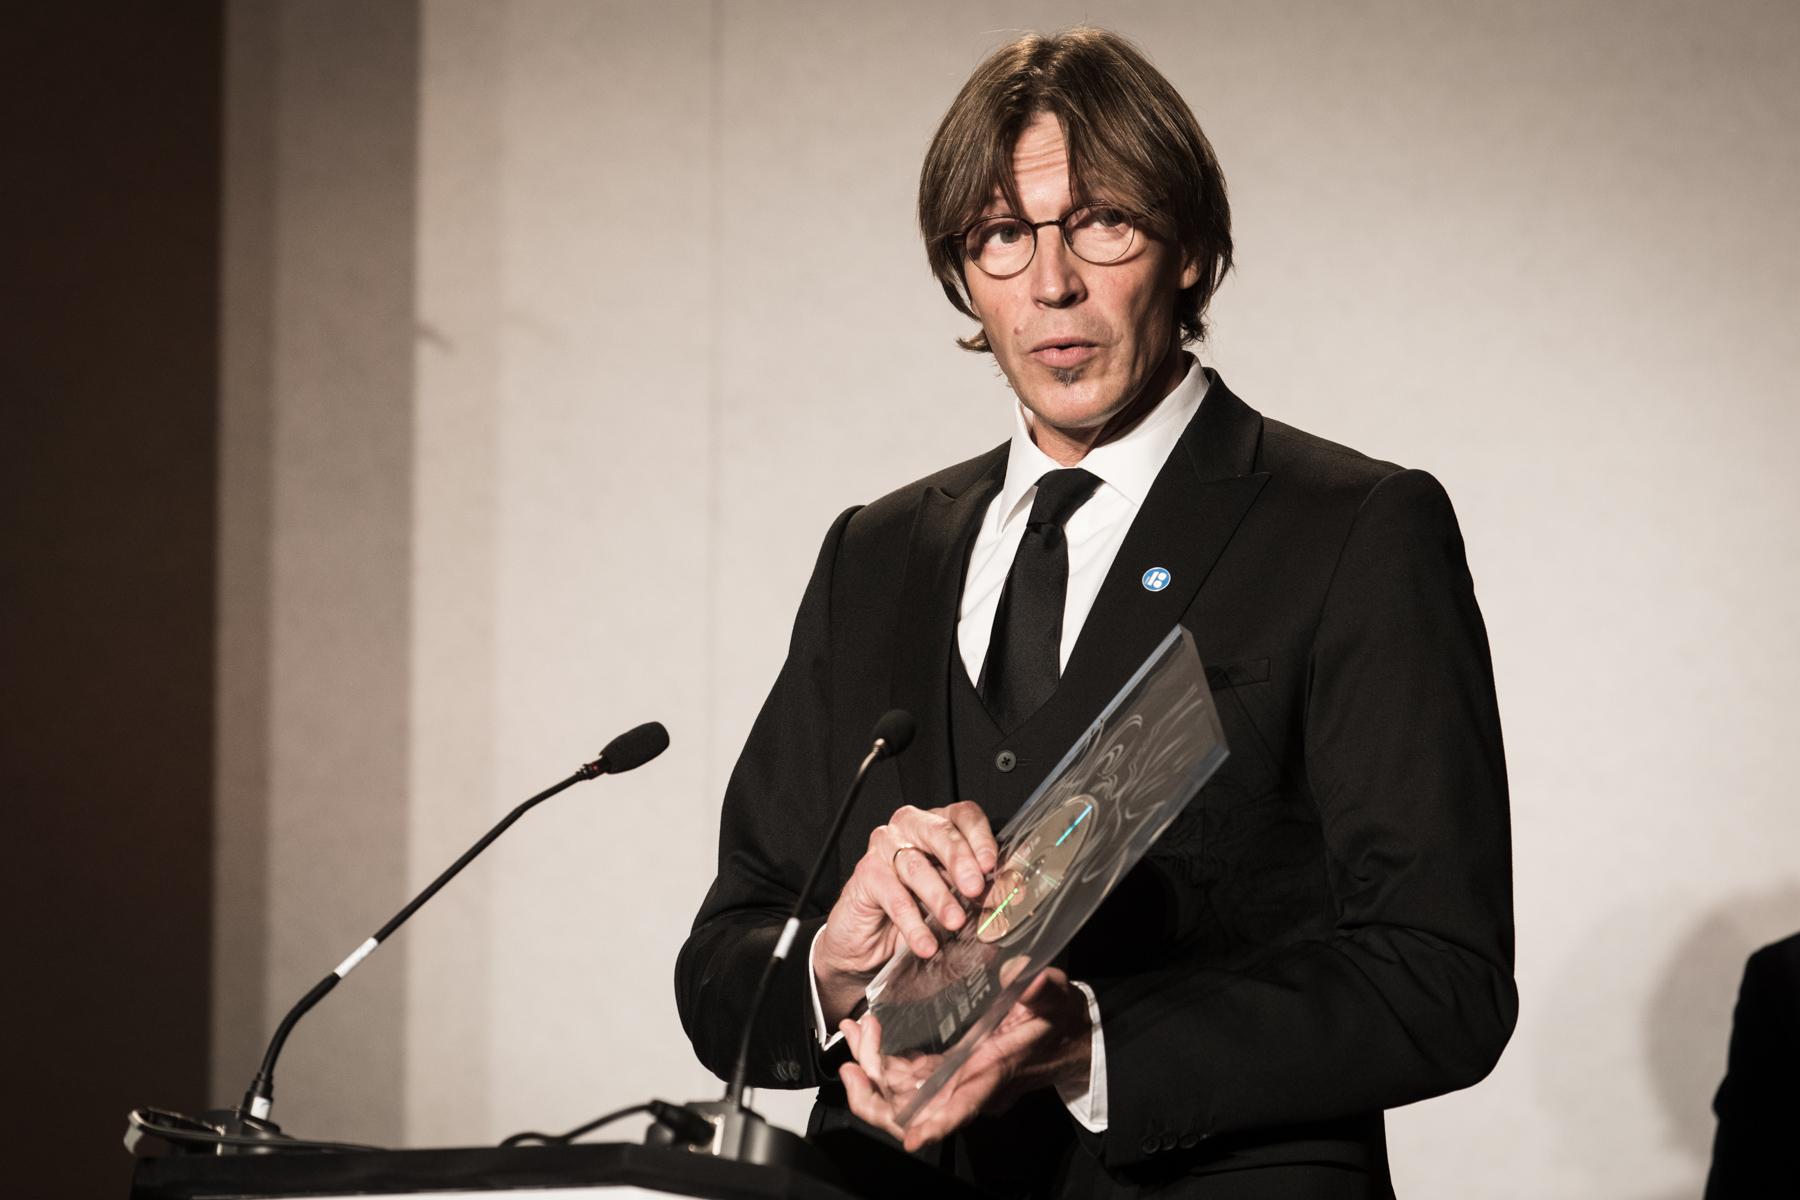 Kaspars Putniņš is presented with the Choral Award